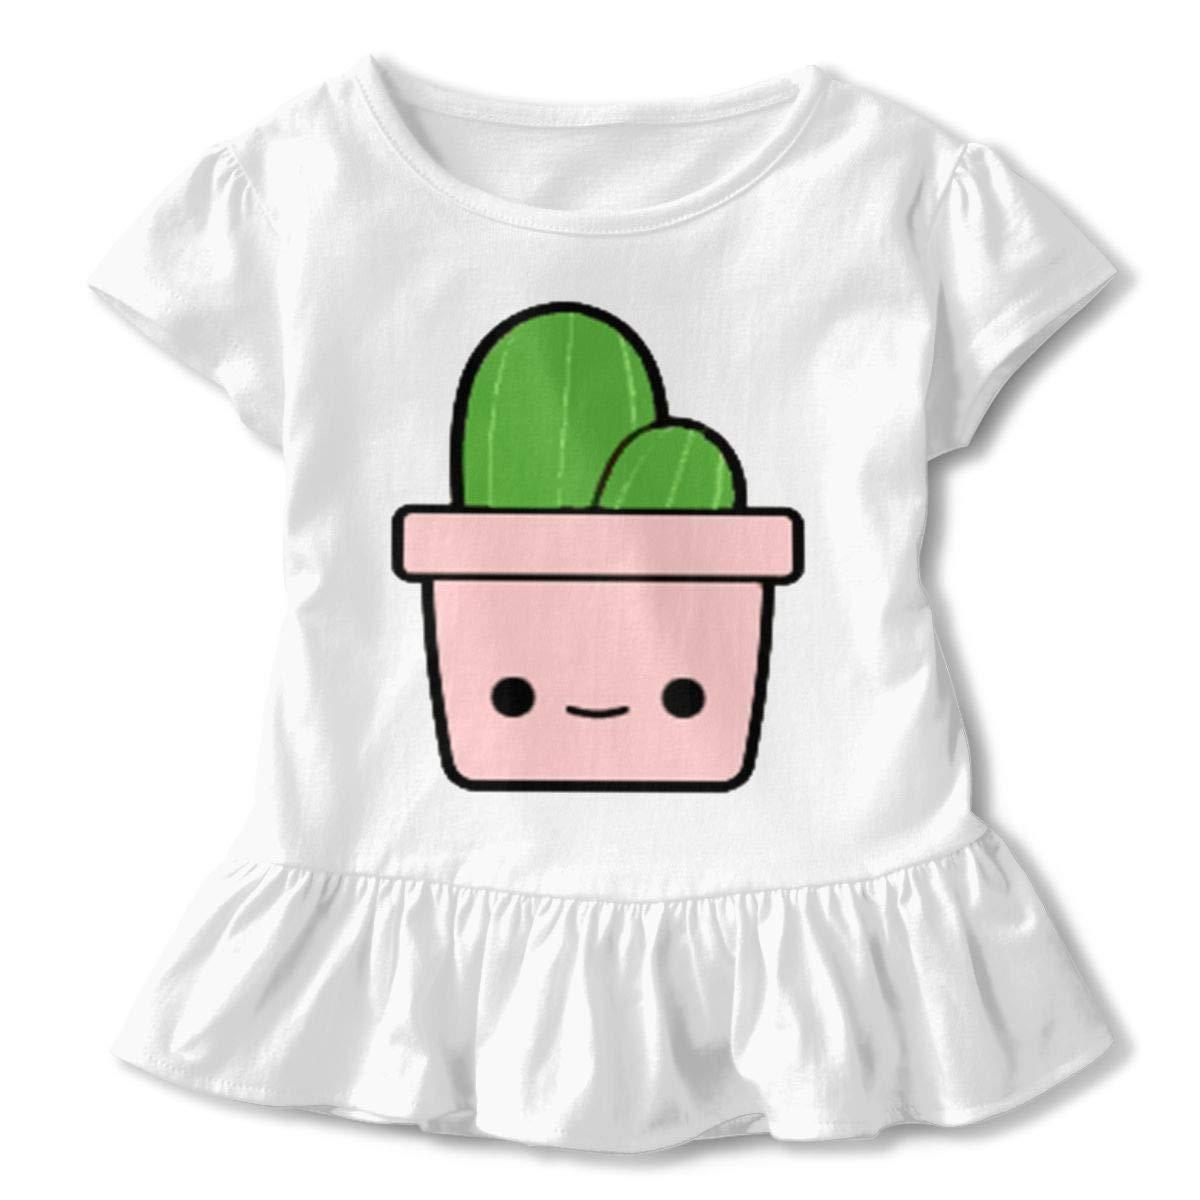 JVNSS Cactus Shirt Comfort Toddler//Infant Flounced T Shirts Graphic T-Shirt for 2-6T Kids Girls